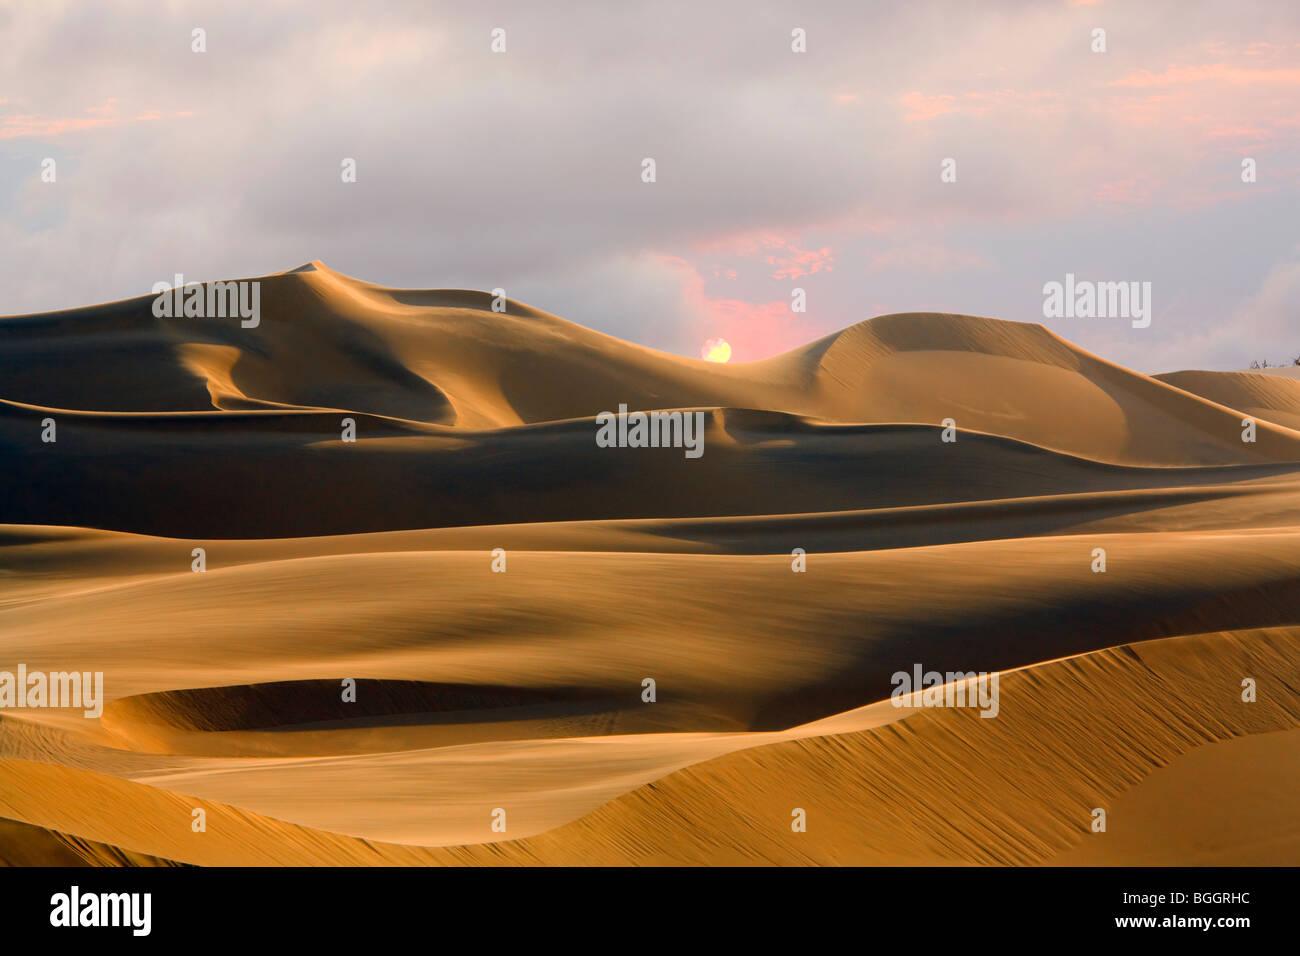 Sand dunes, Sossusvlei, Namib Desert, Namibia - Stock Image